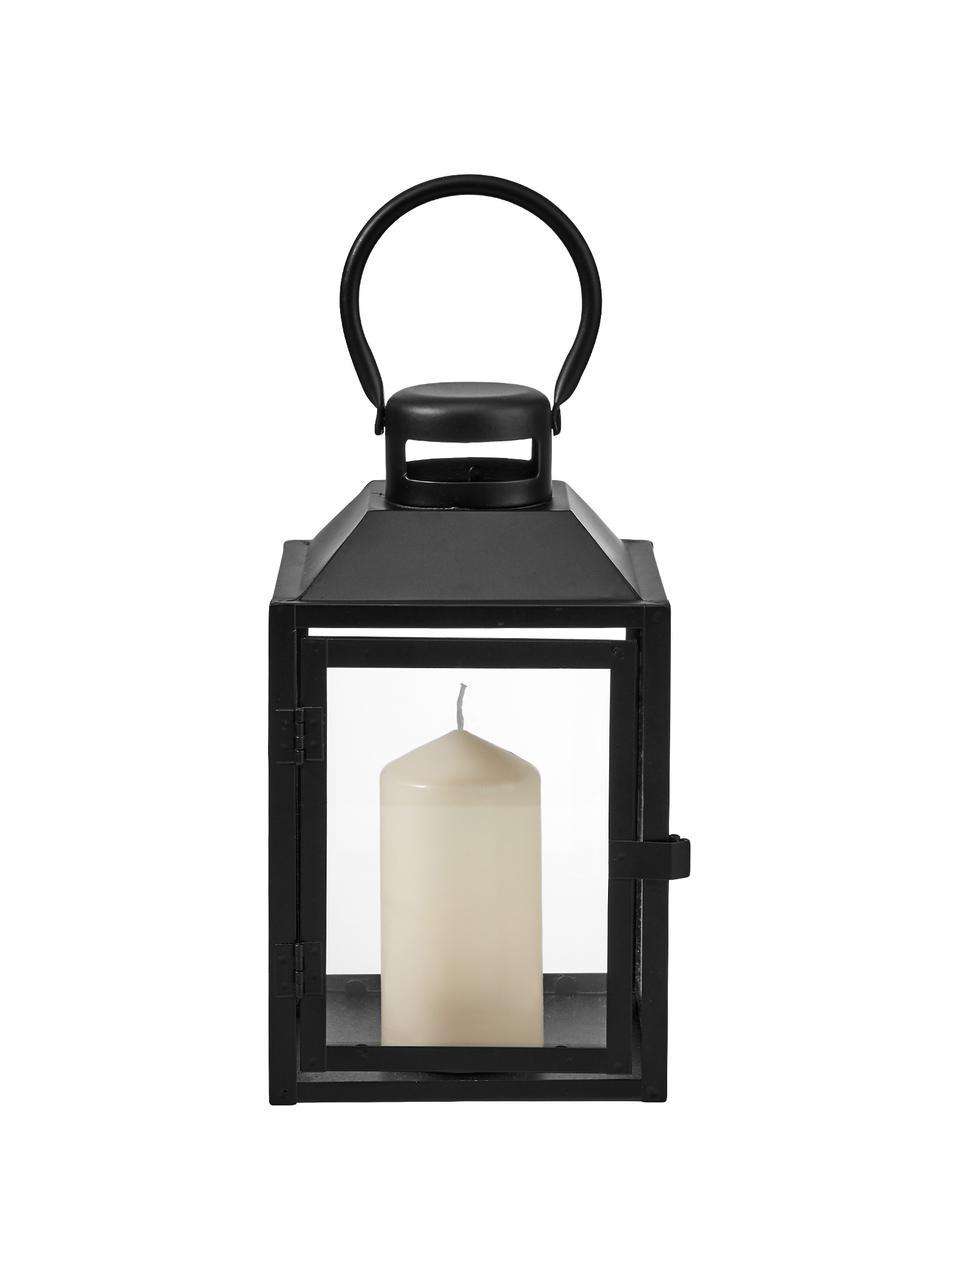 Lanterna in metallo Lighthouse, Metallo, vetro, Nero, trasparente, Larg. 13 x Alt. 24 cm